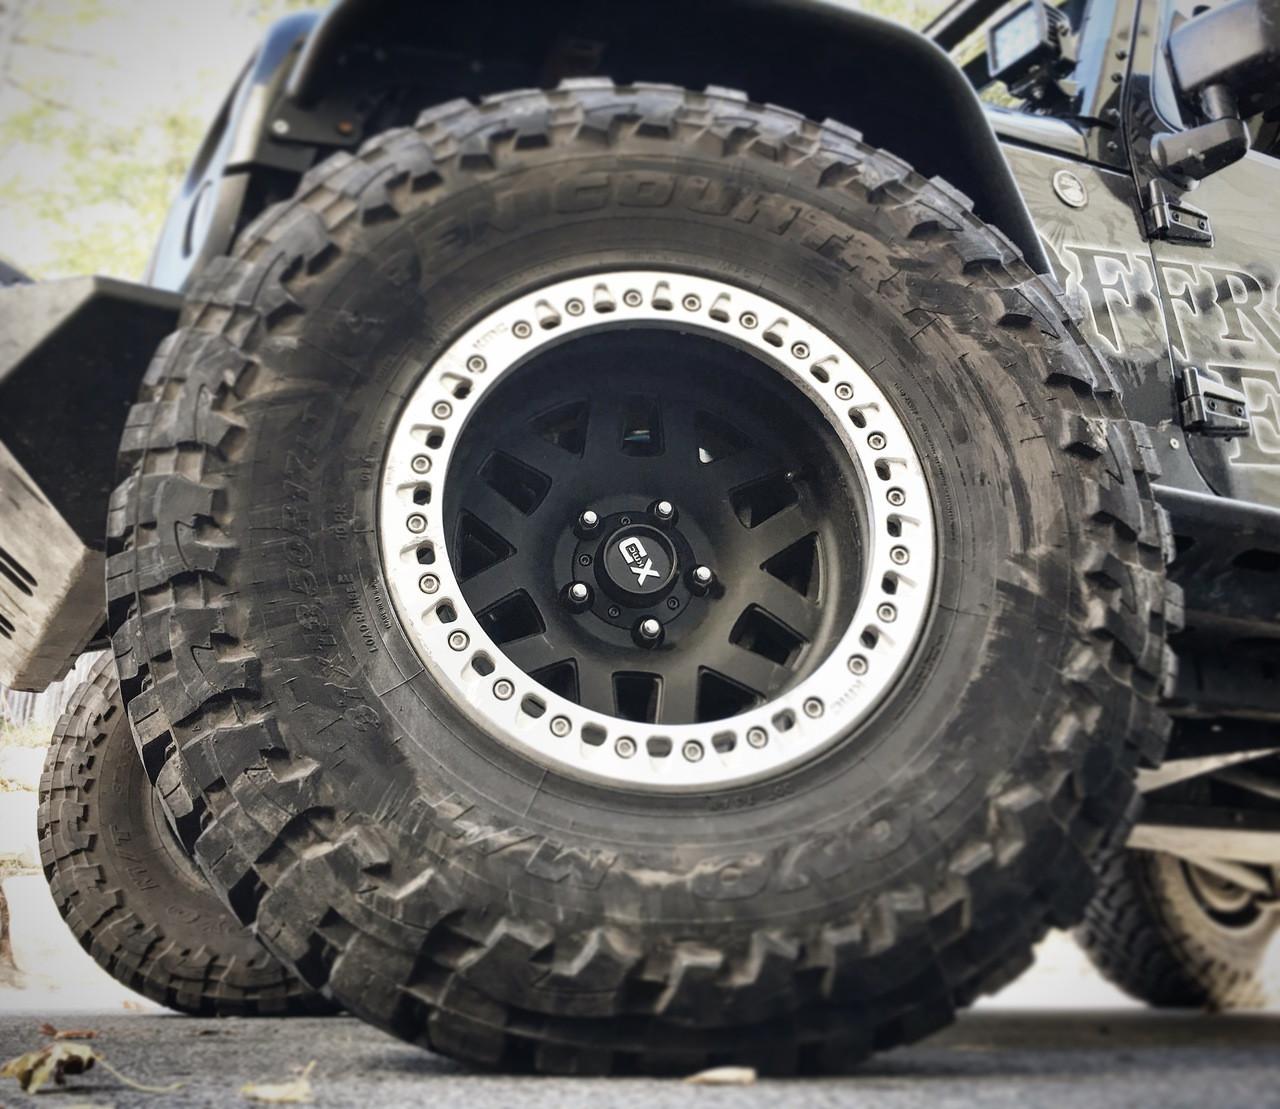 KMC Wheels XD229 Machete Beadlock Satin Black with Machined Ring- 17x9 / 5x127.00